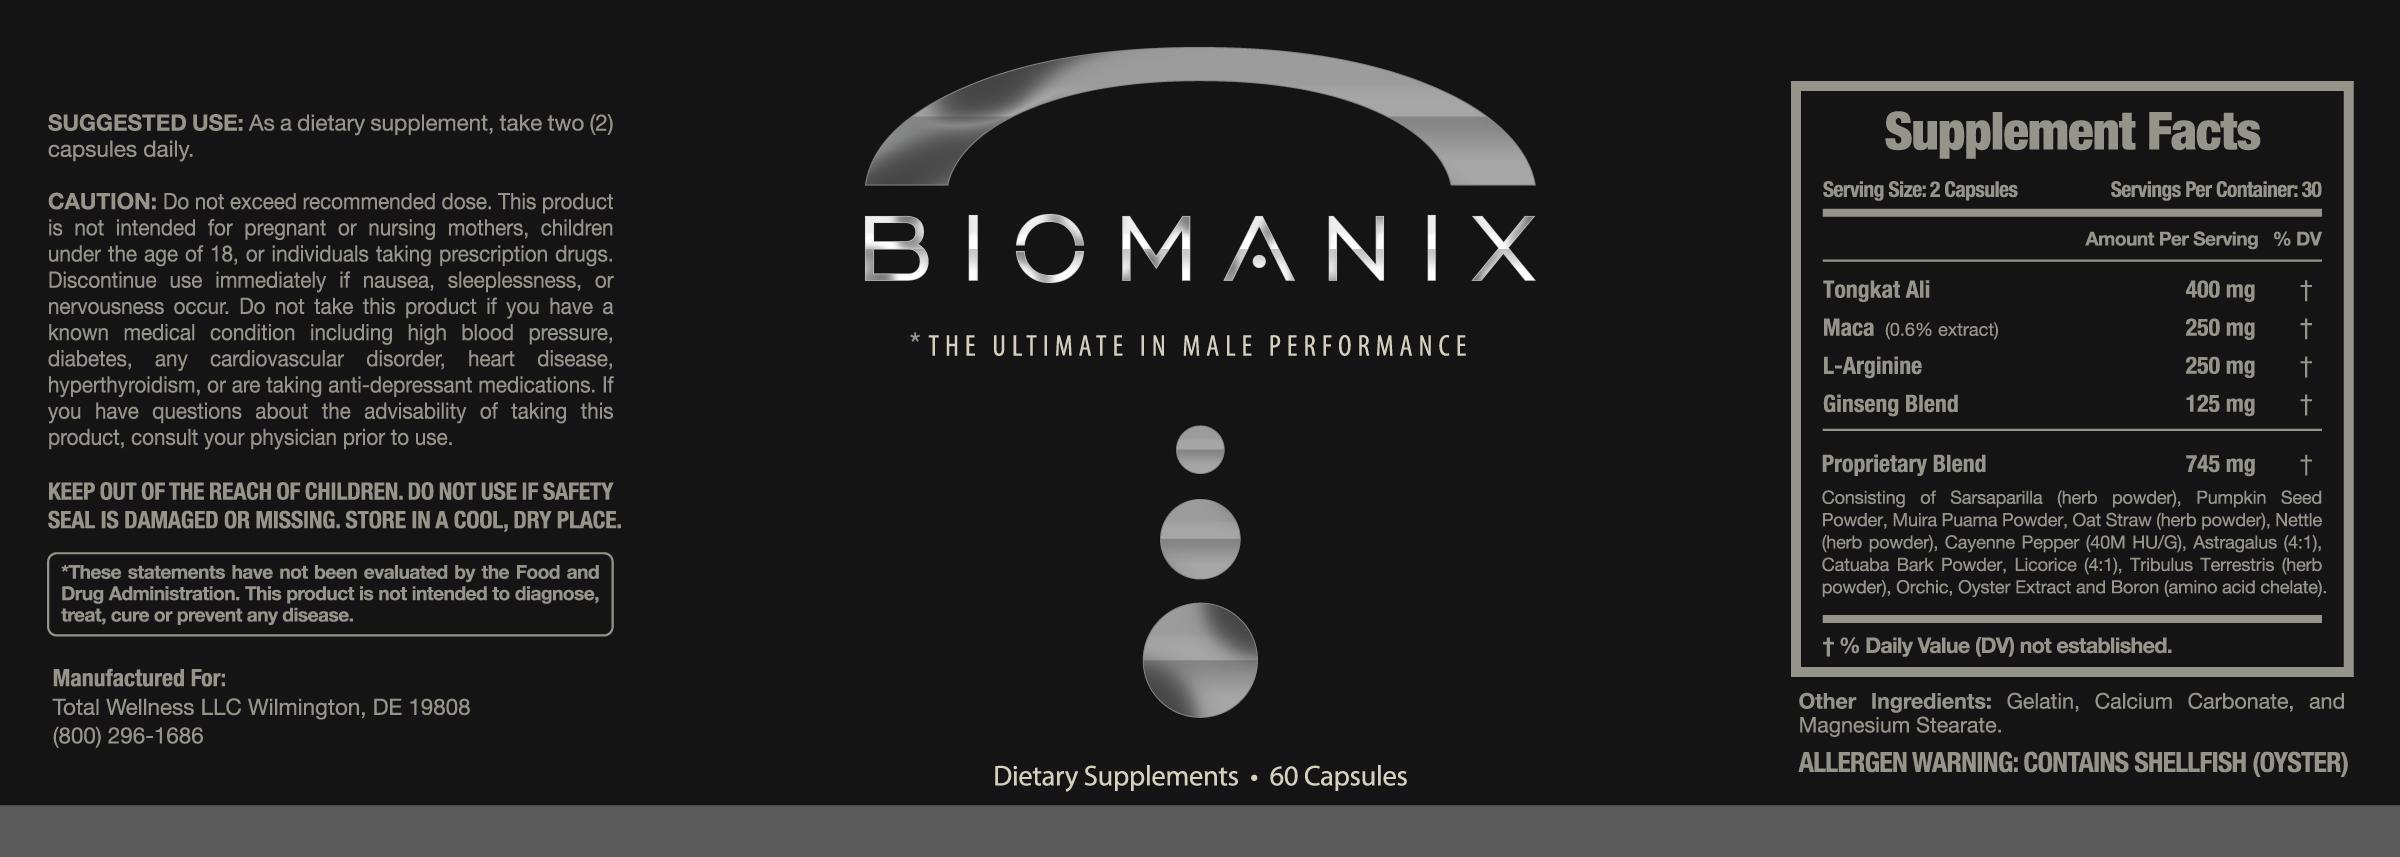 Biomanix Review Ingredients Breakdown – #1 MALE PERFORMANCE PRODUCT